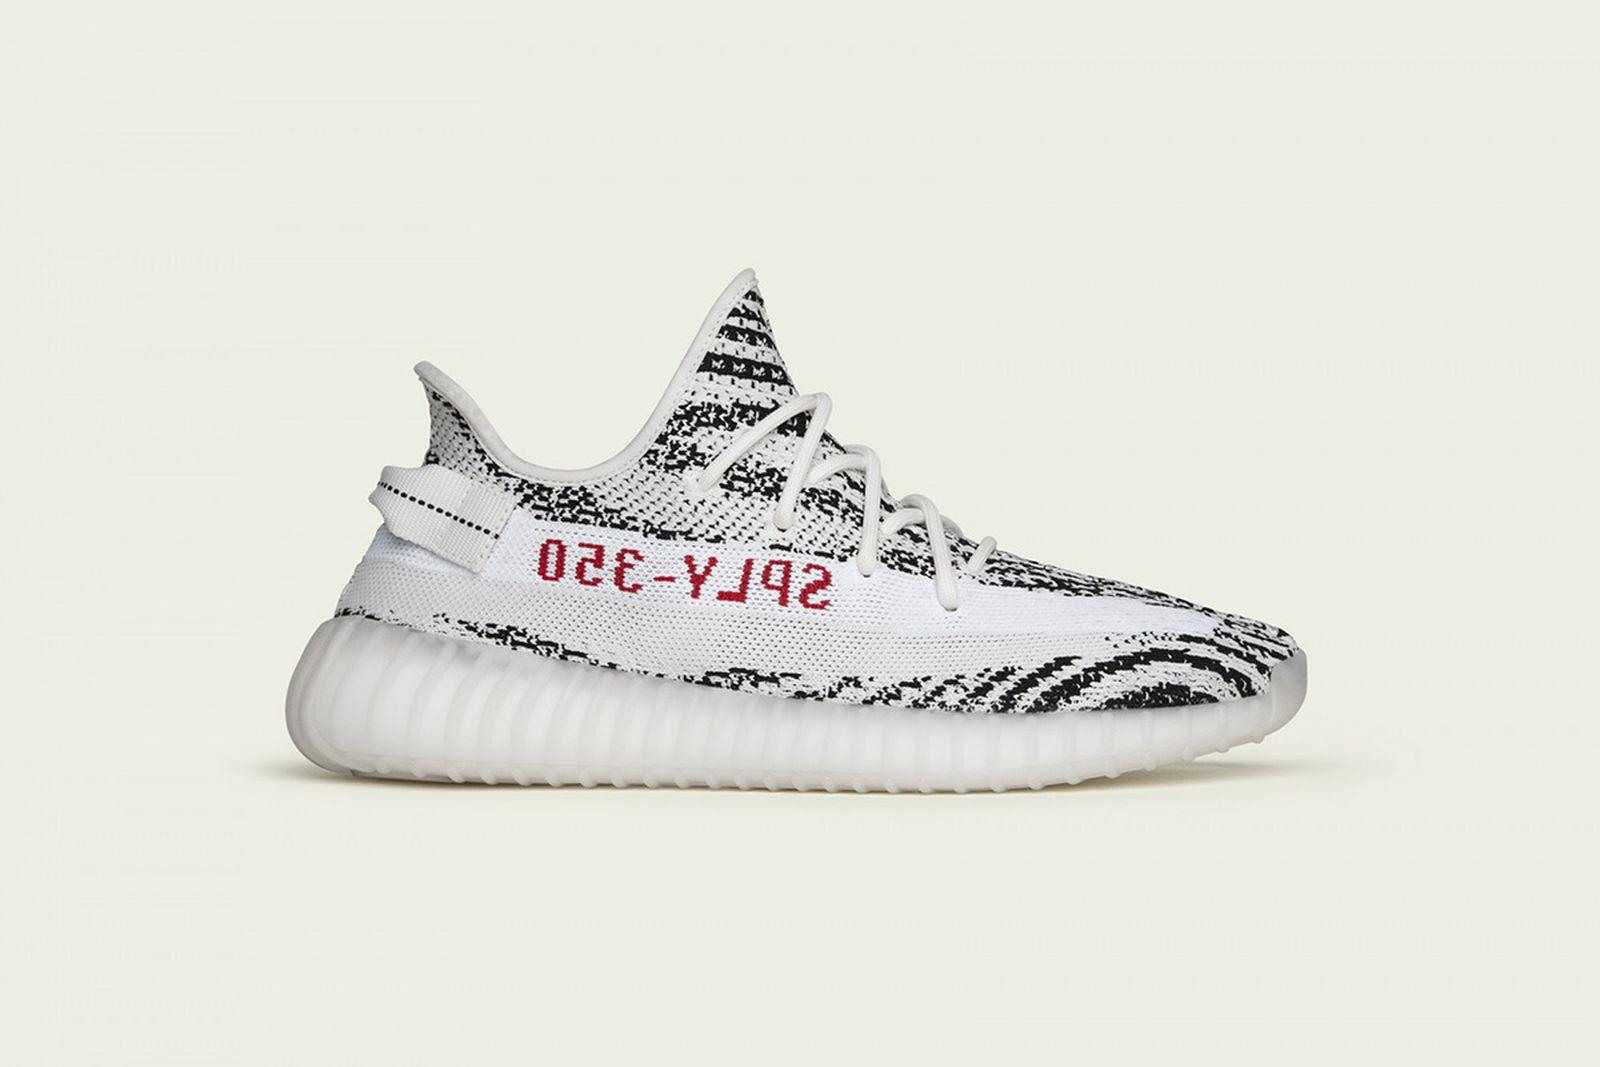 adidas yeezy boost 350 v2 zebra restock StockX adidas Originals YEEZY Boost 350 V2 kanye west